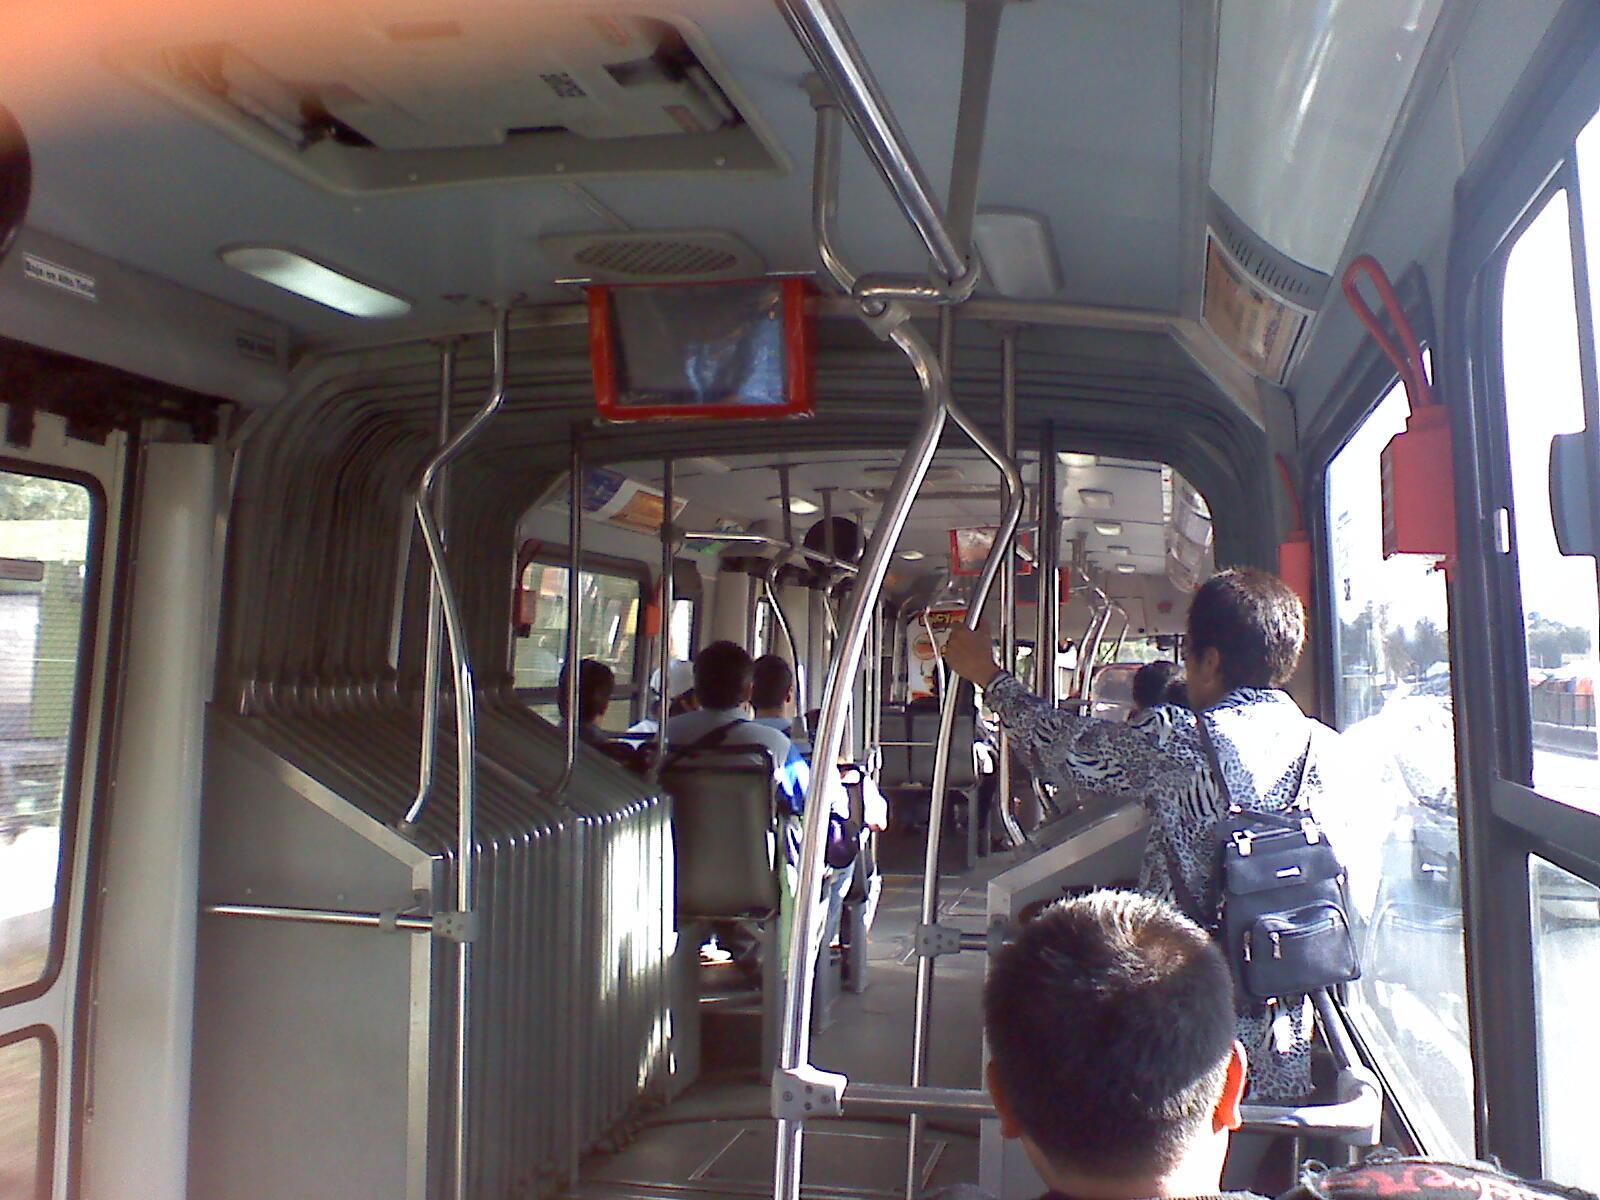 Los Angeles Metro Bus Interior Images